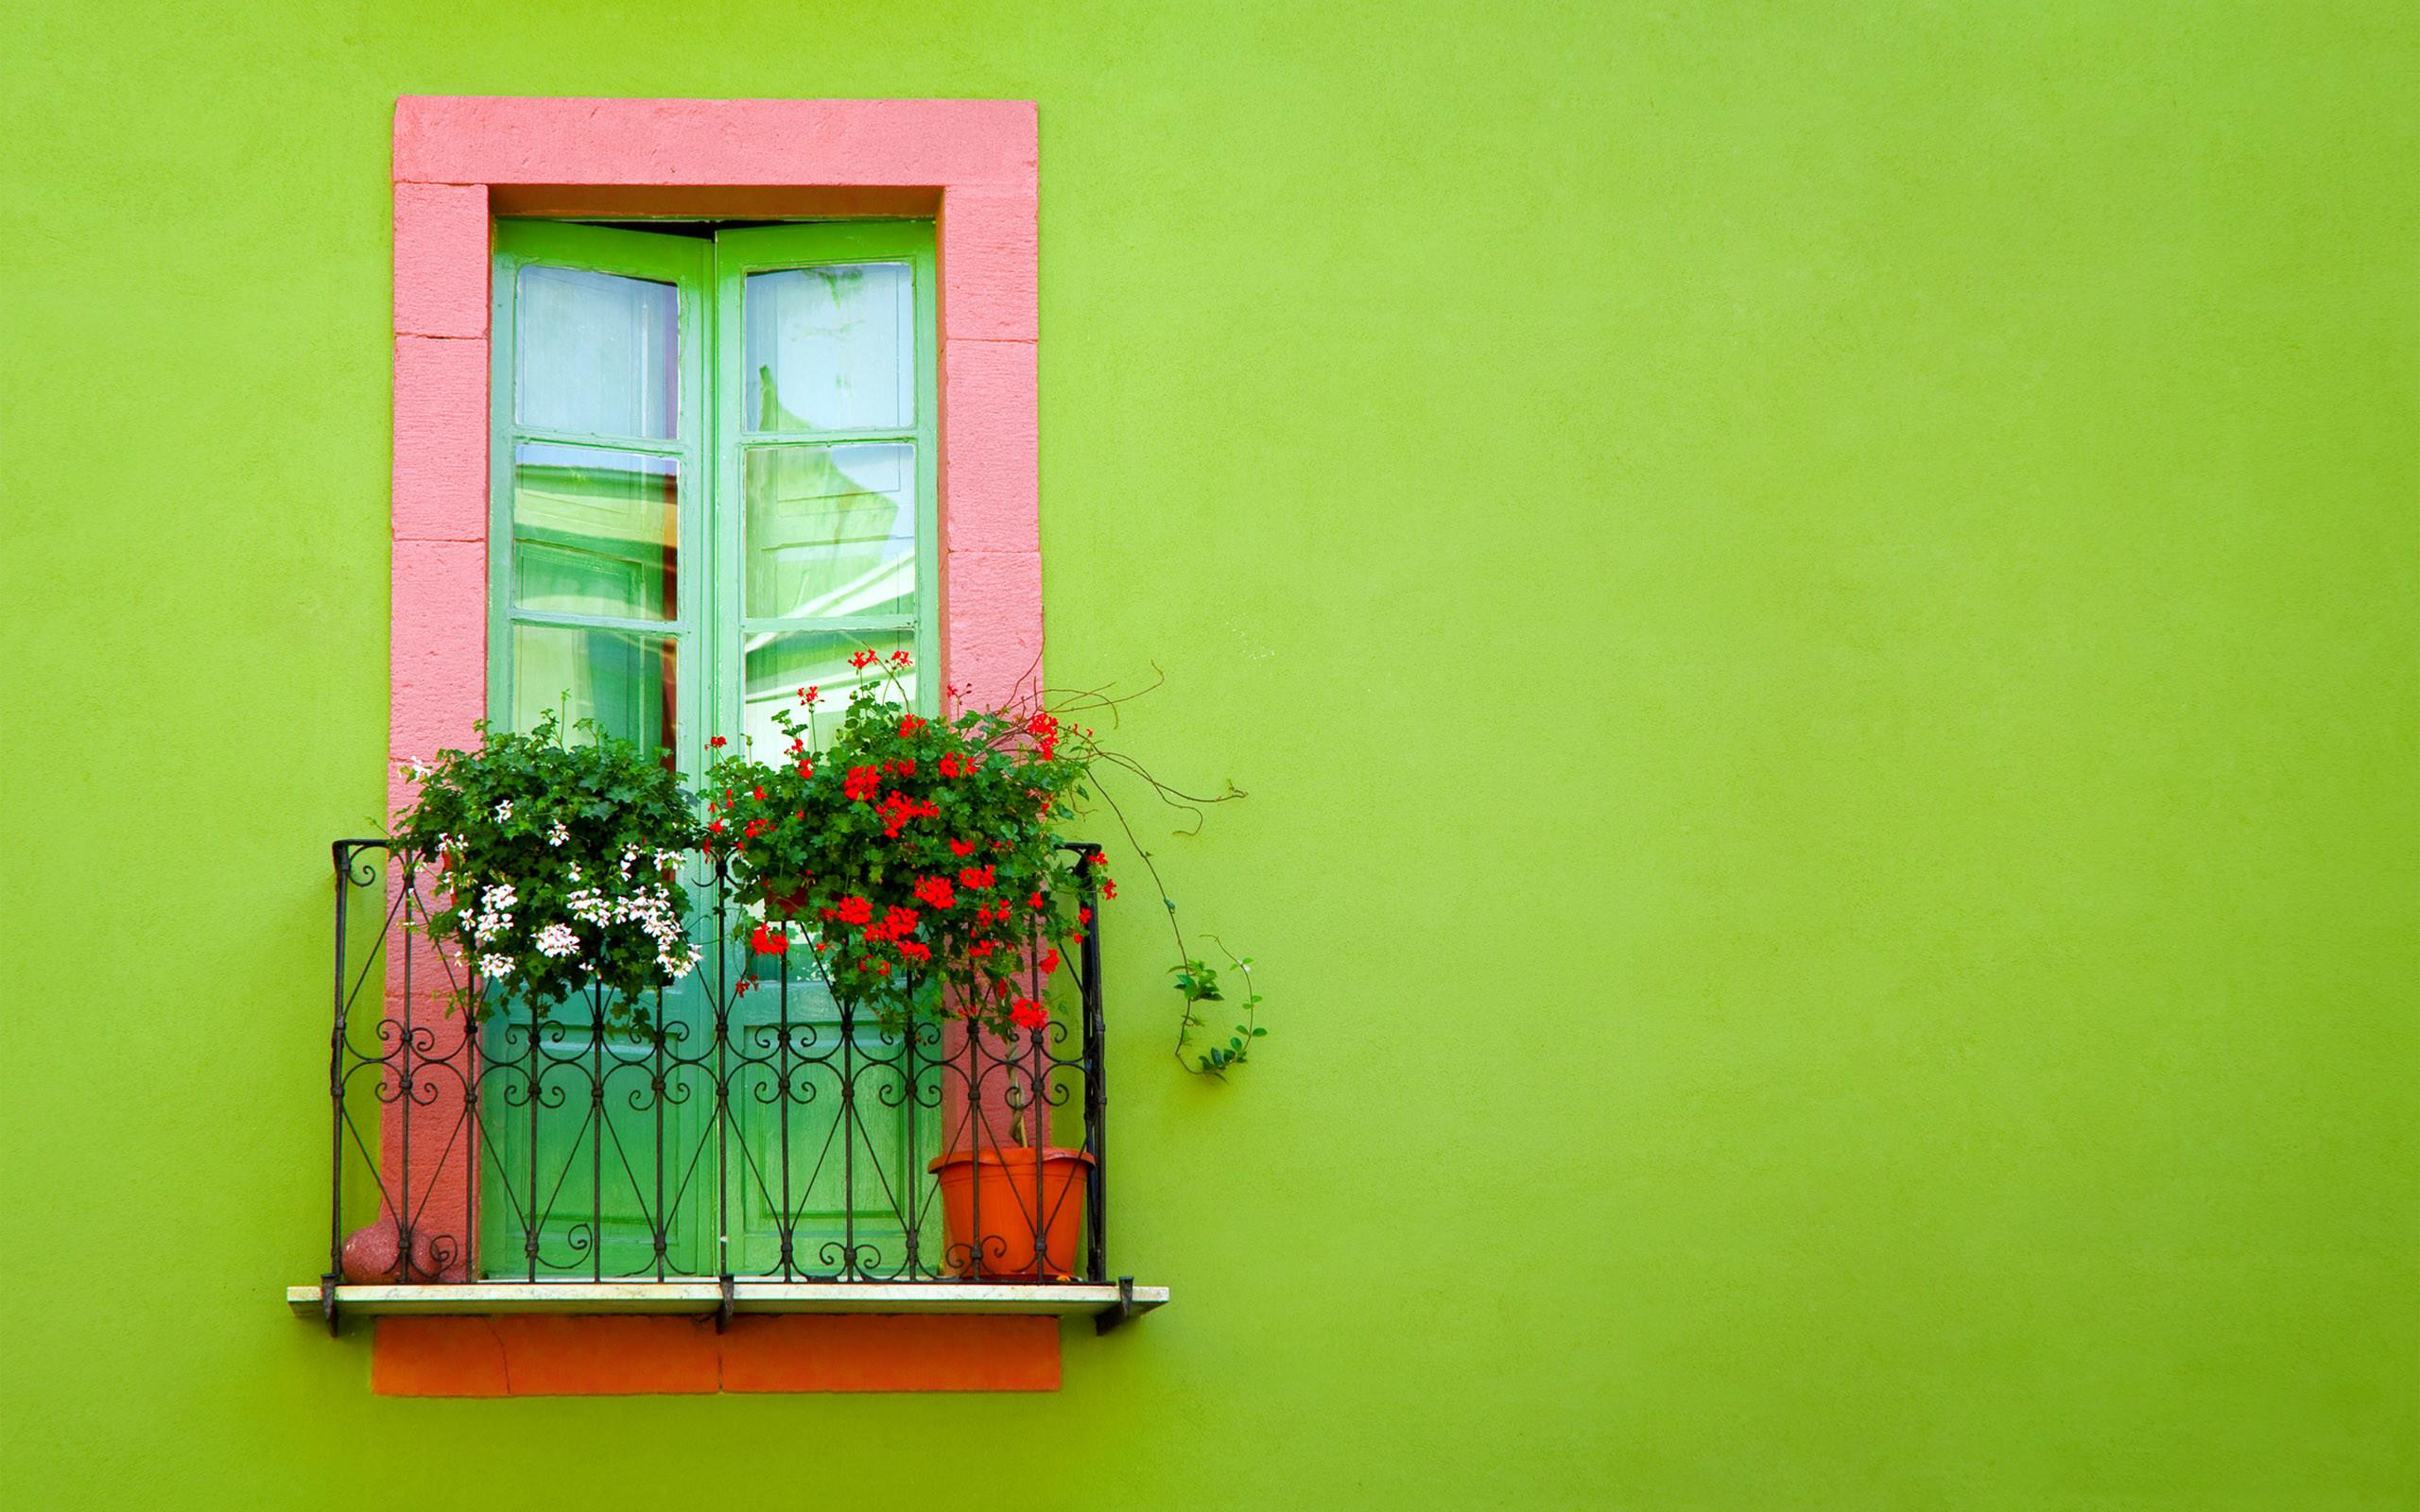 Res: 2560x1600, Man Made - Window Green Flower Plant Artistic Wallpaper